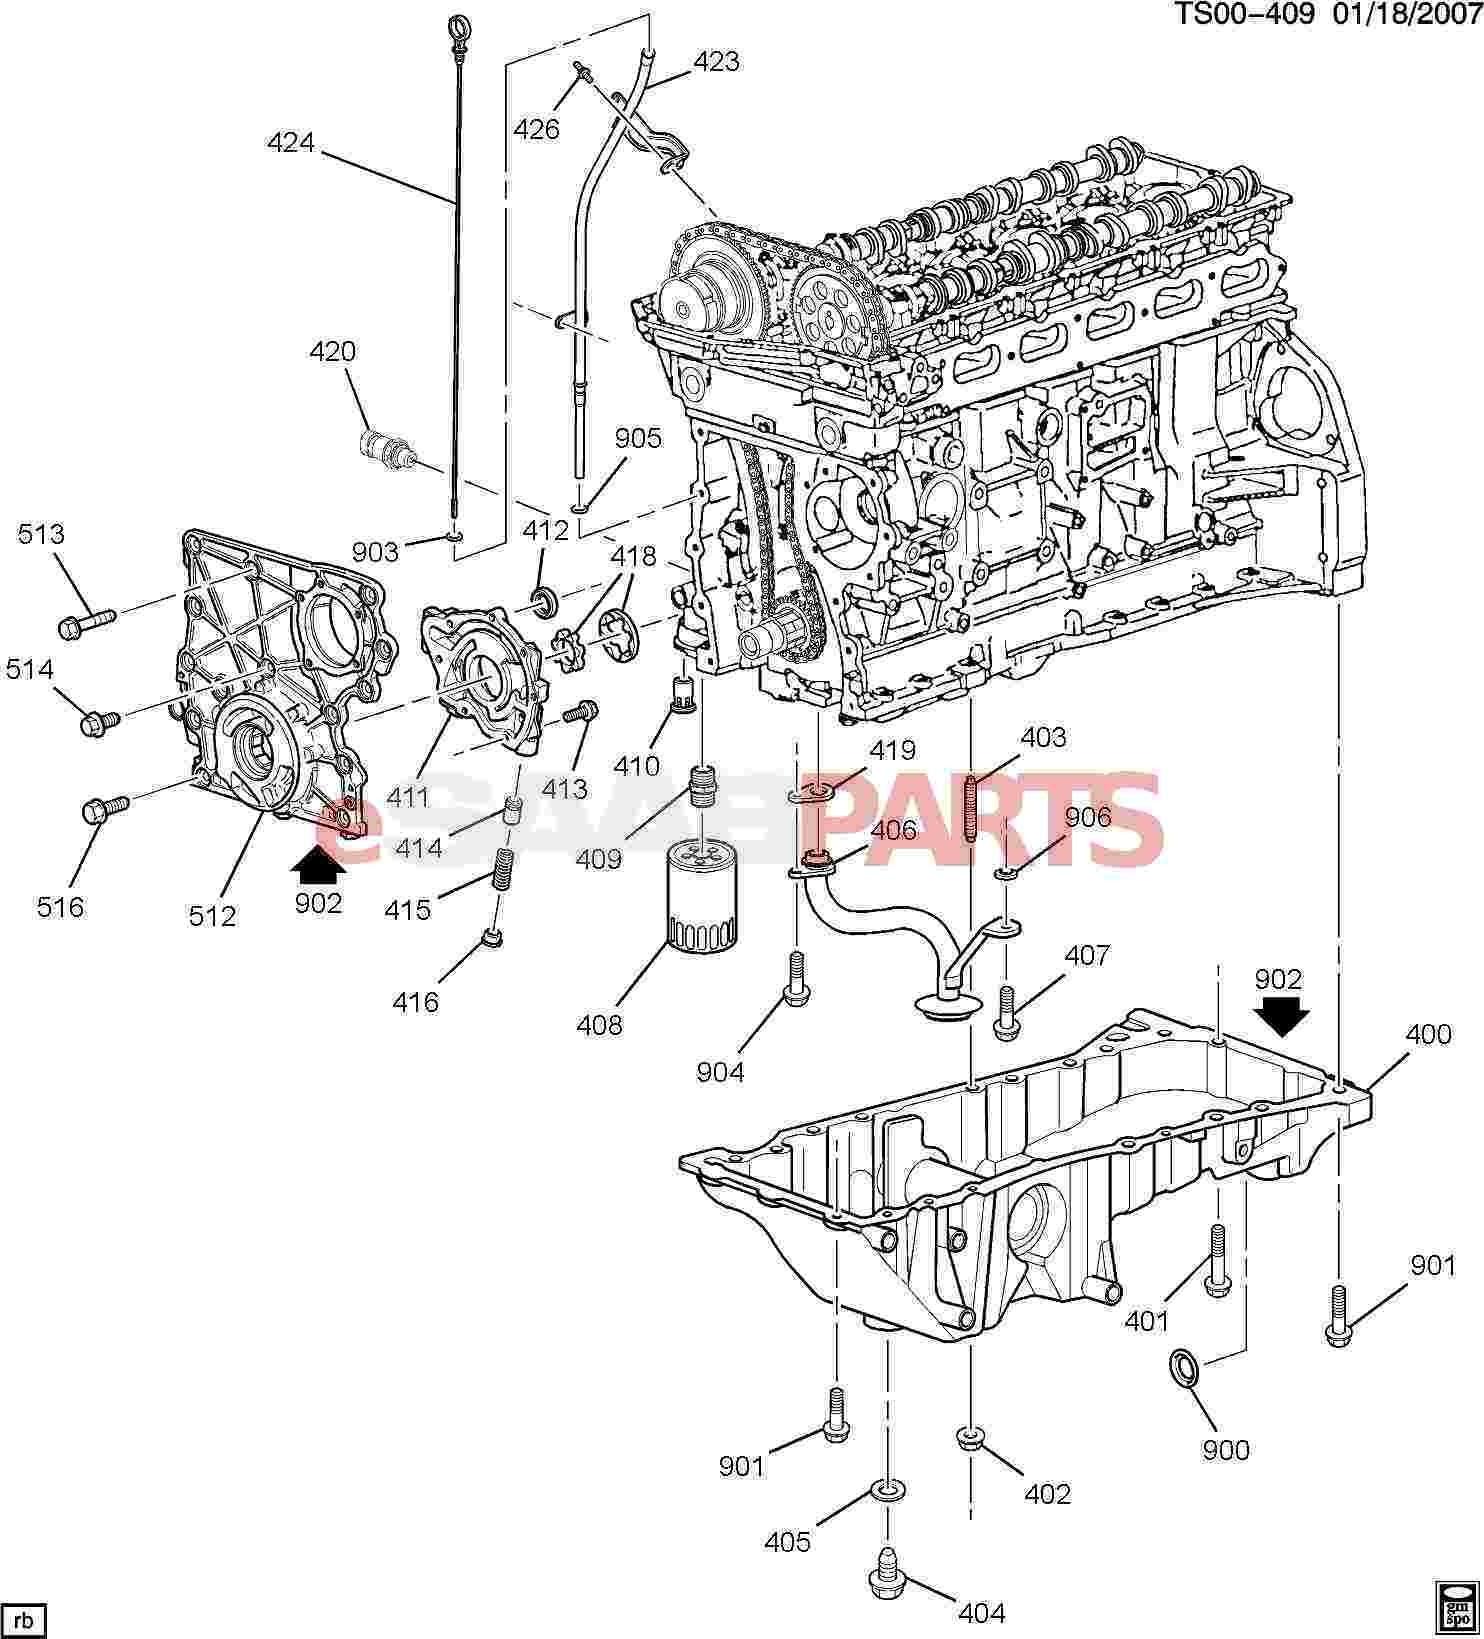 2003 Chevy Trailblazer Engine Diagram ] Saab Hexagon Screw Genuine Saab Parts From Esaabparts Of 2003 Chevy Trailblazer Engine Diagram